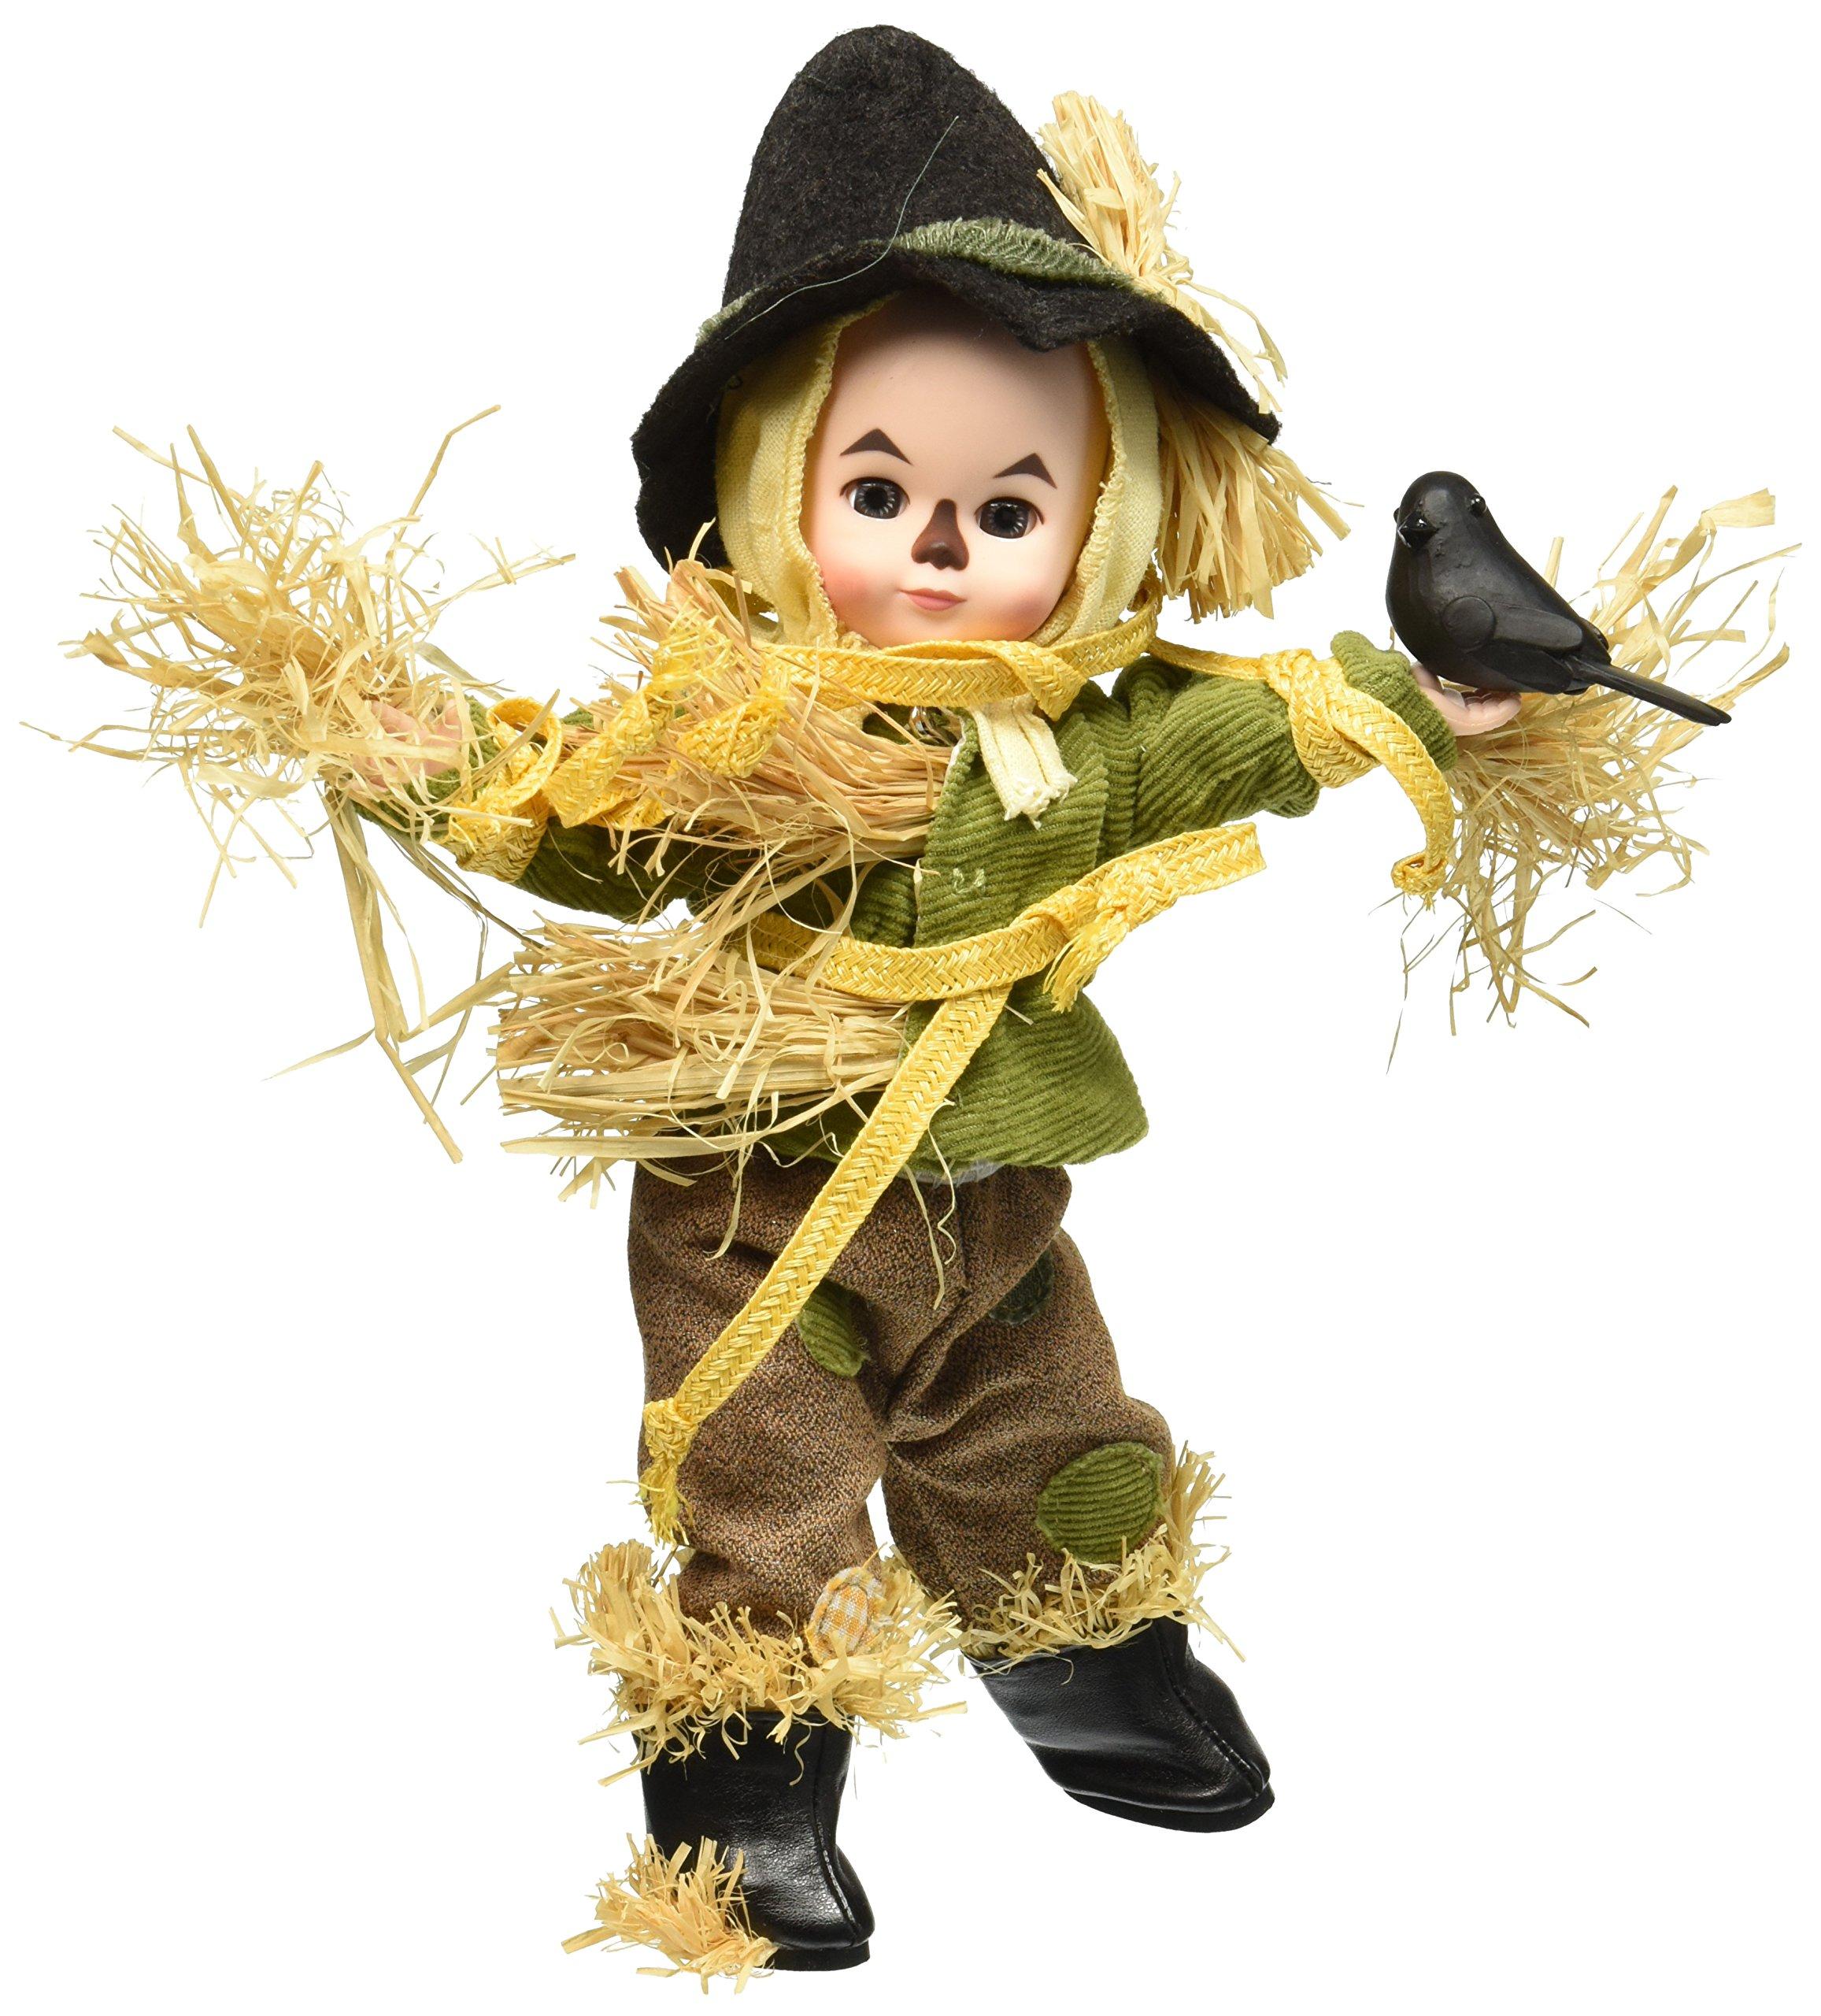 Madame Alexander 8'' New Scarecrow, The Wizard of Oz Collection